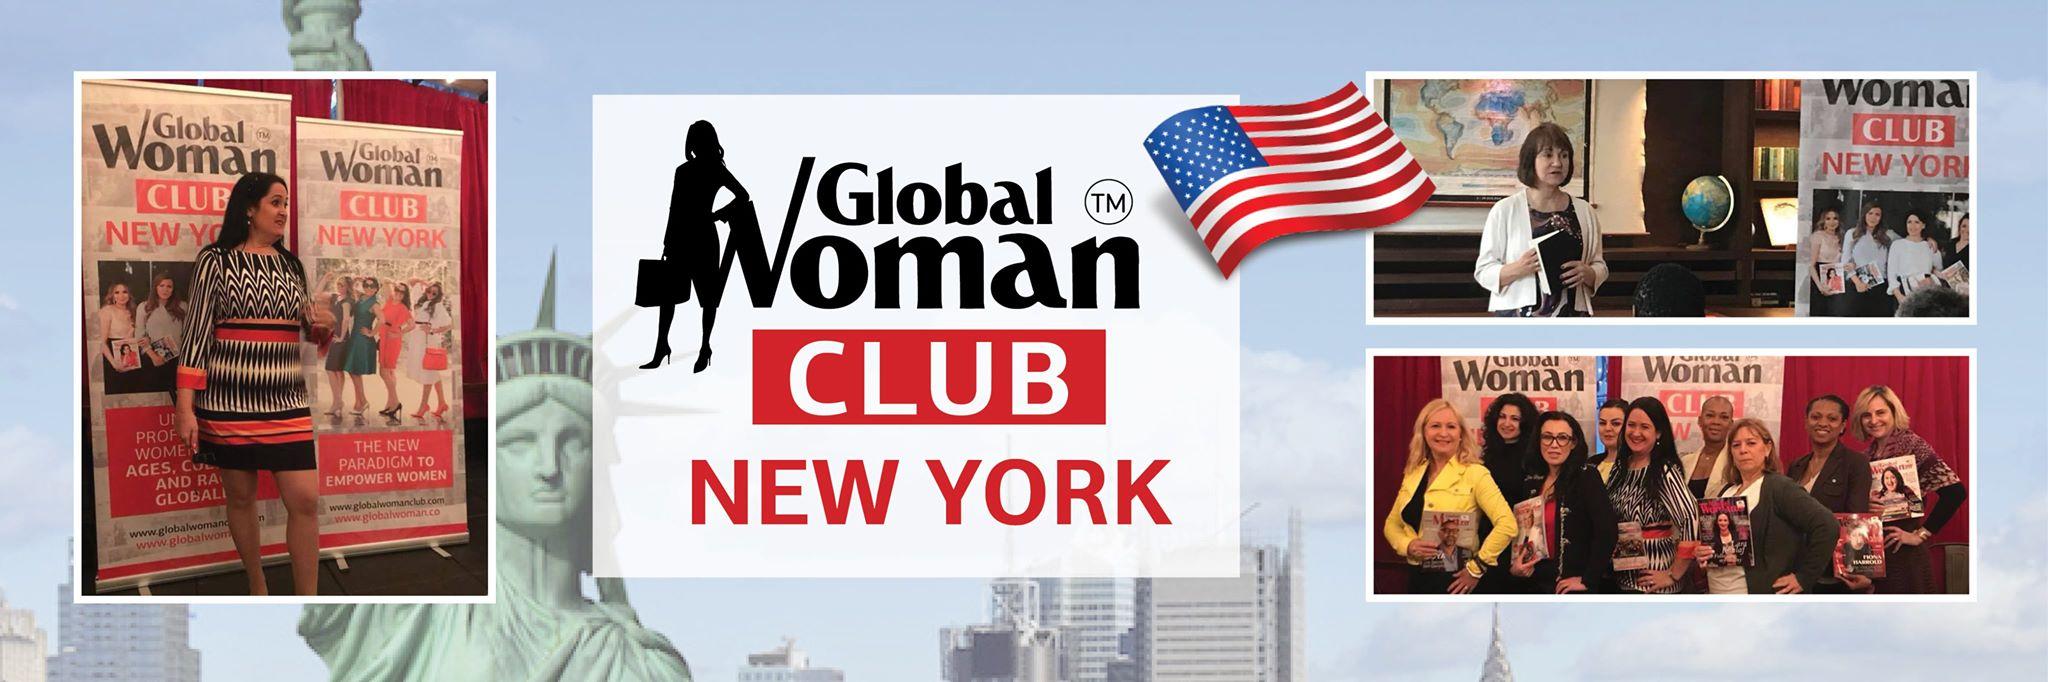 GLOBAL WOMAN CLUB New York : BUSINESS NETWORKING MEETING - February